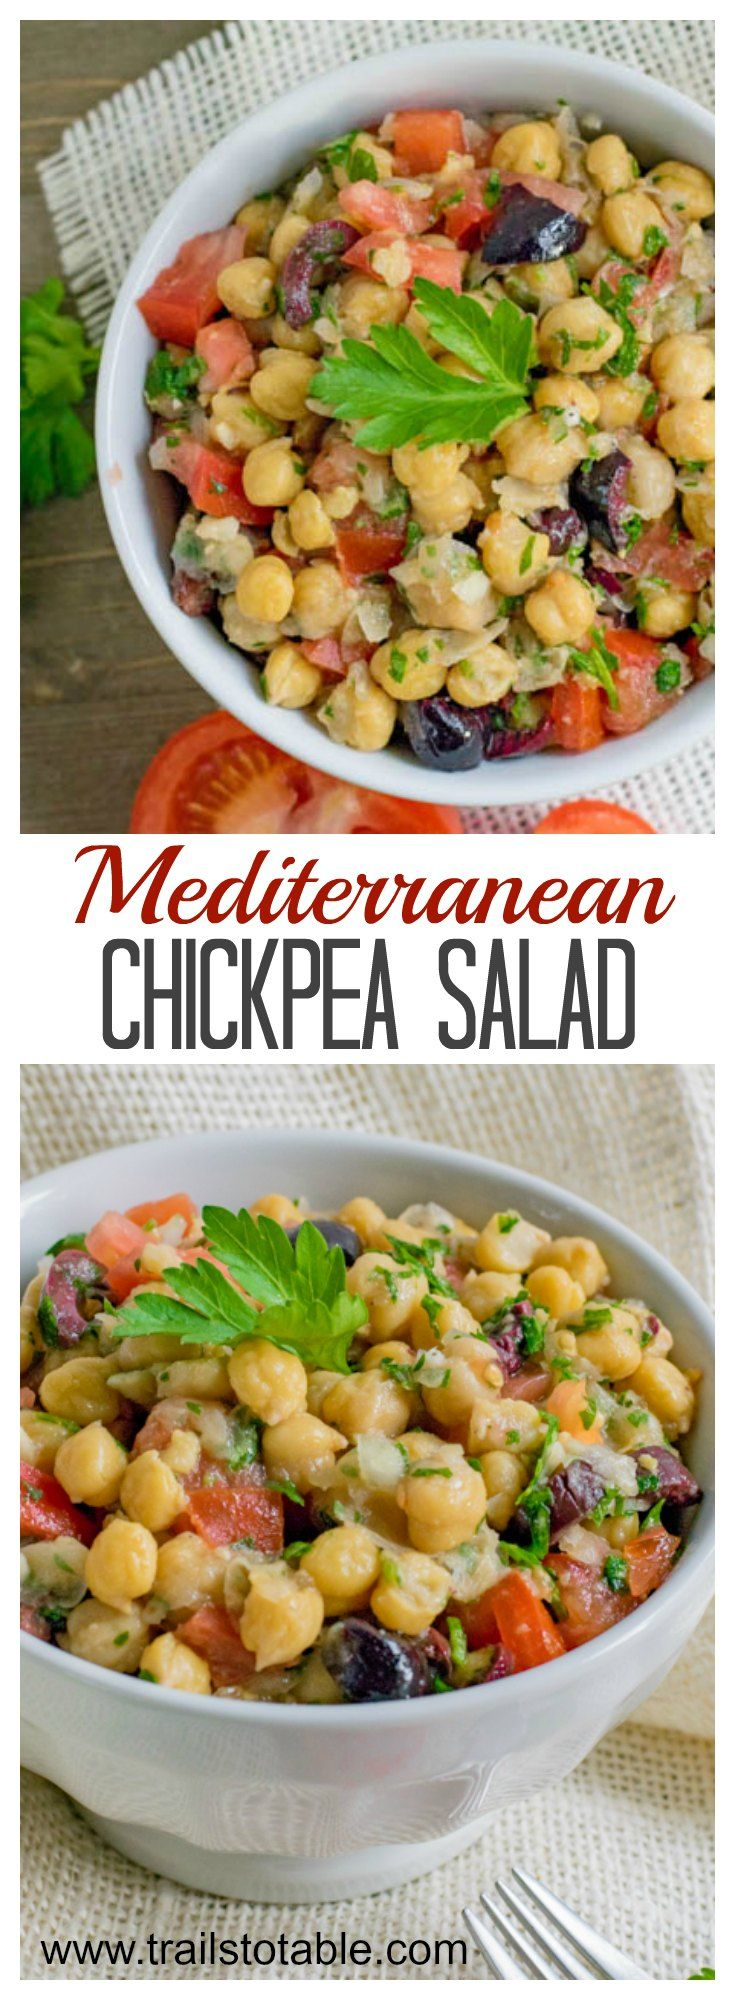 Chickpea Salad. Easy, healthy, and delicious!